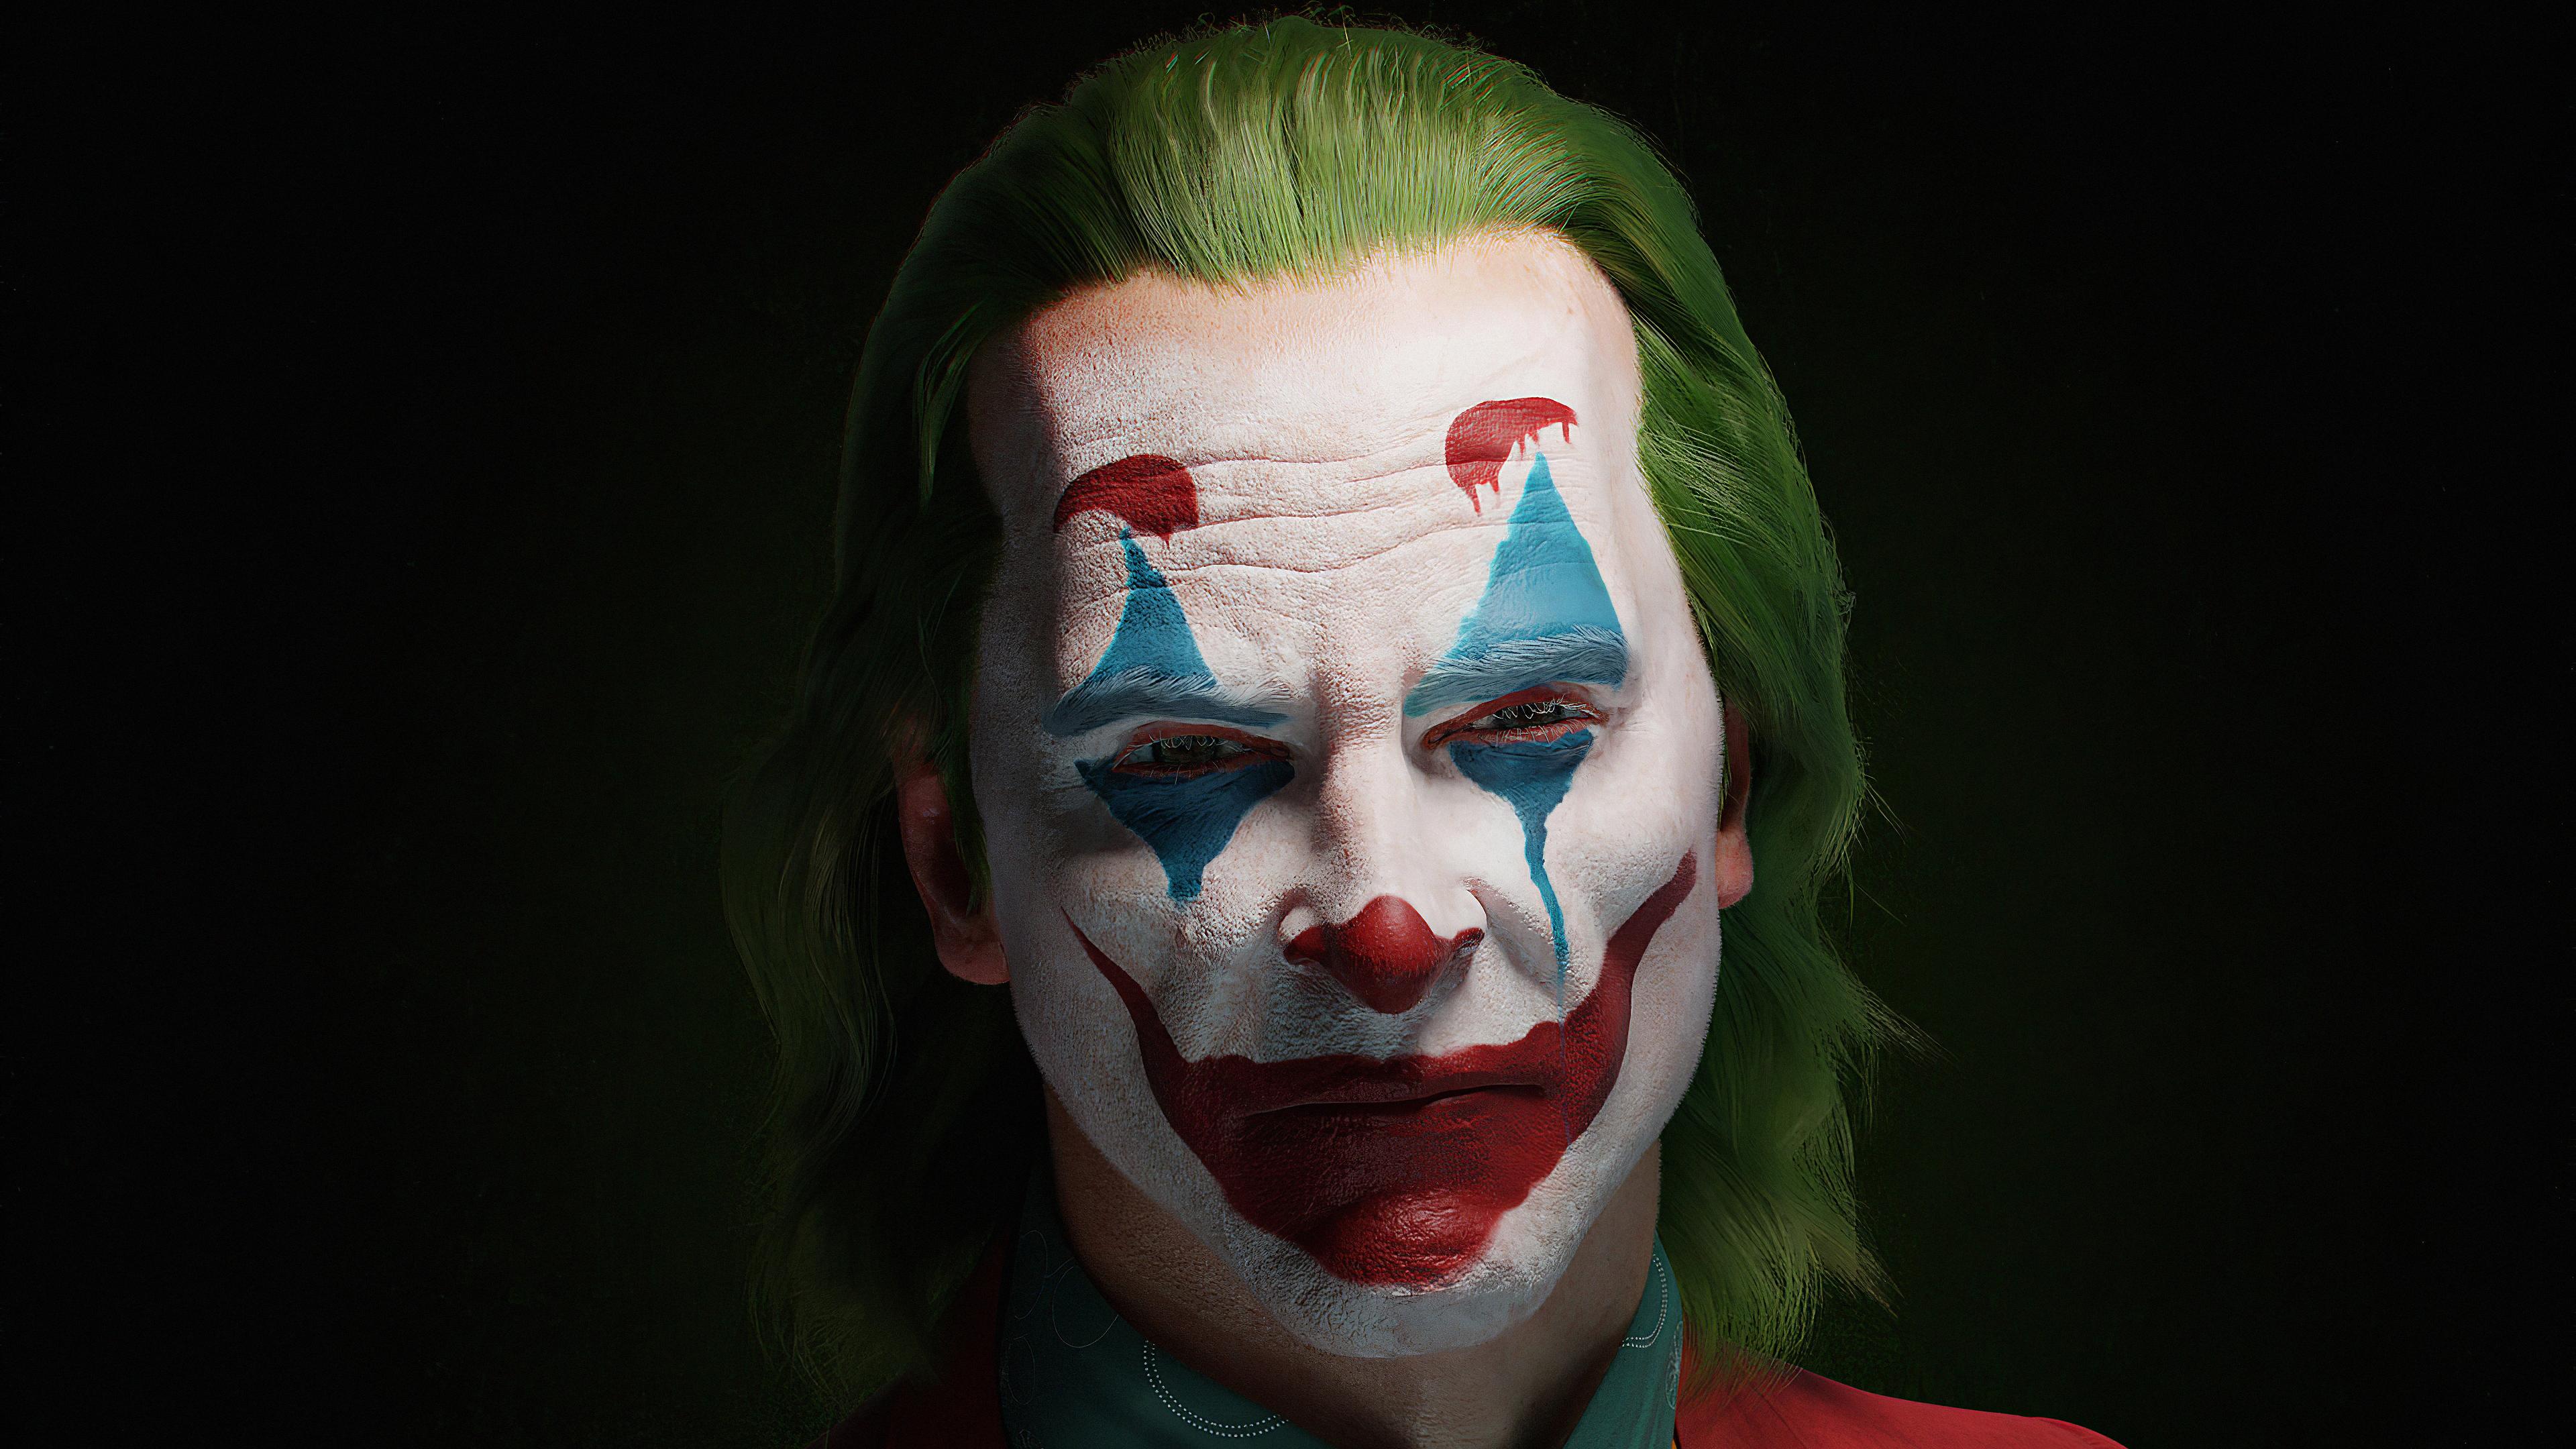 joker movie clown 1572368779 - Joker Movie Clown - joker m wallpapers